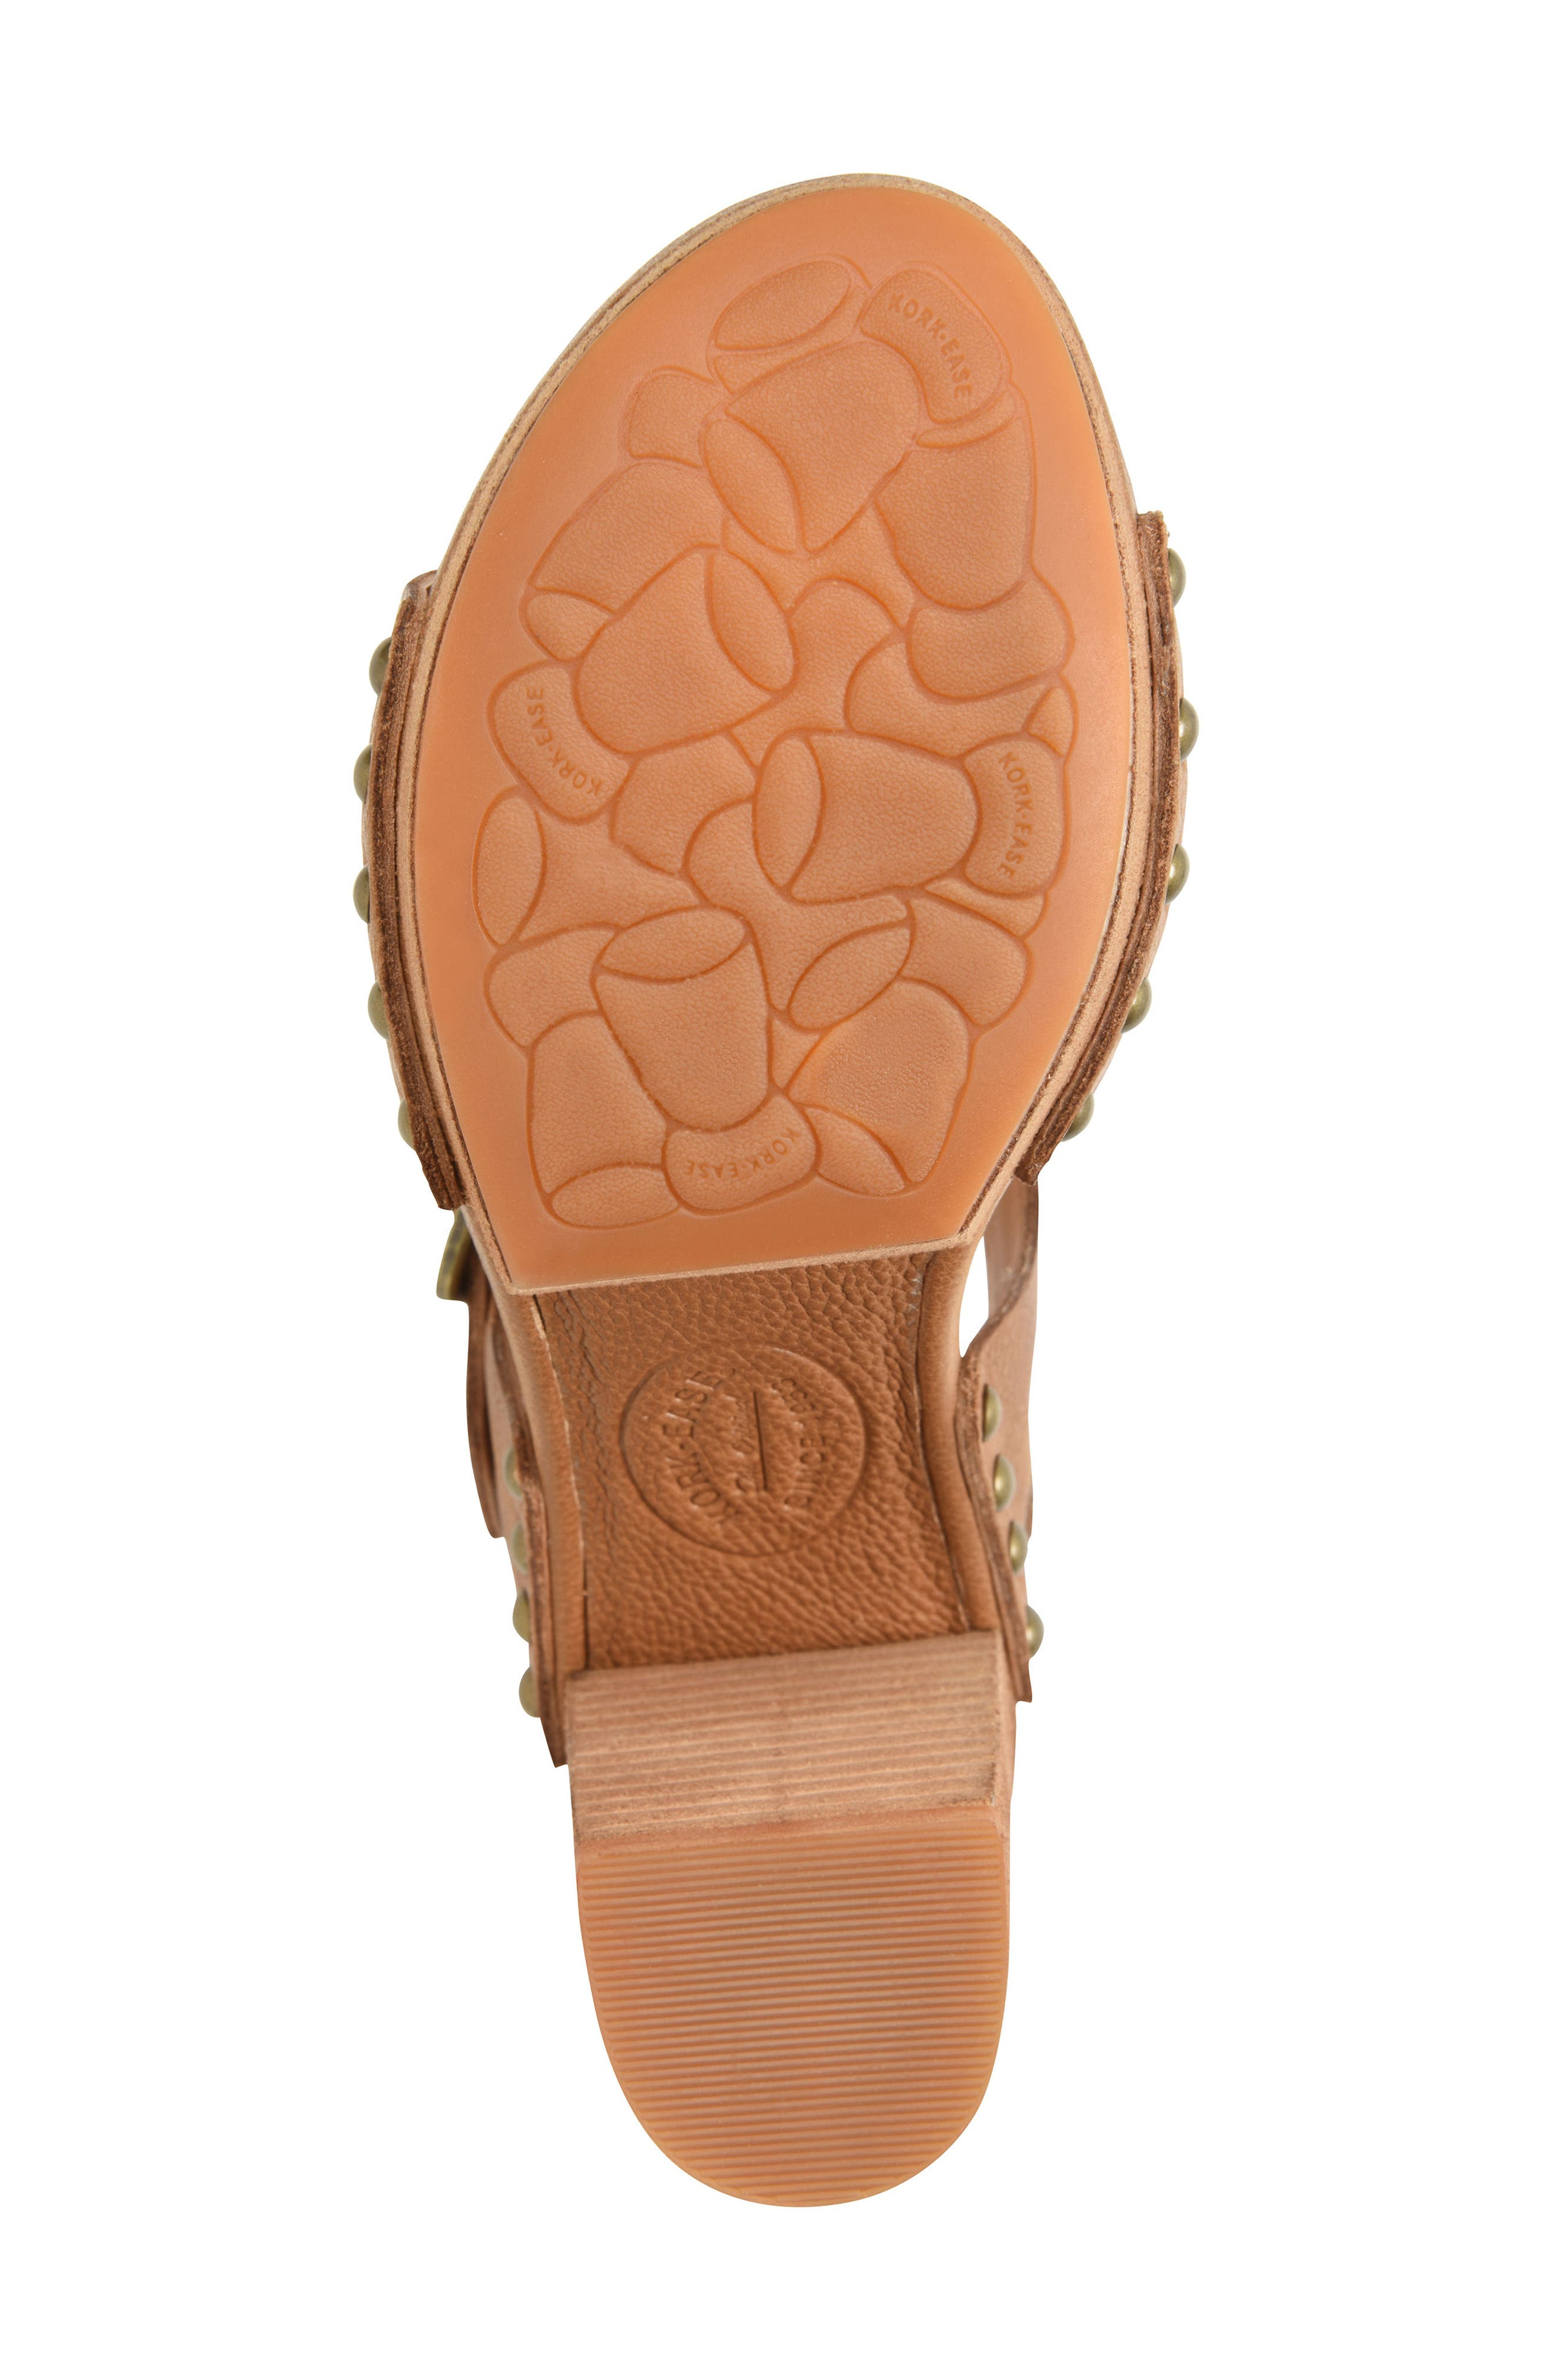 Pasilla Platform Sandal,                             Alternate thumbnail 6, color,                             Light Brown Leather